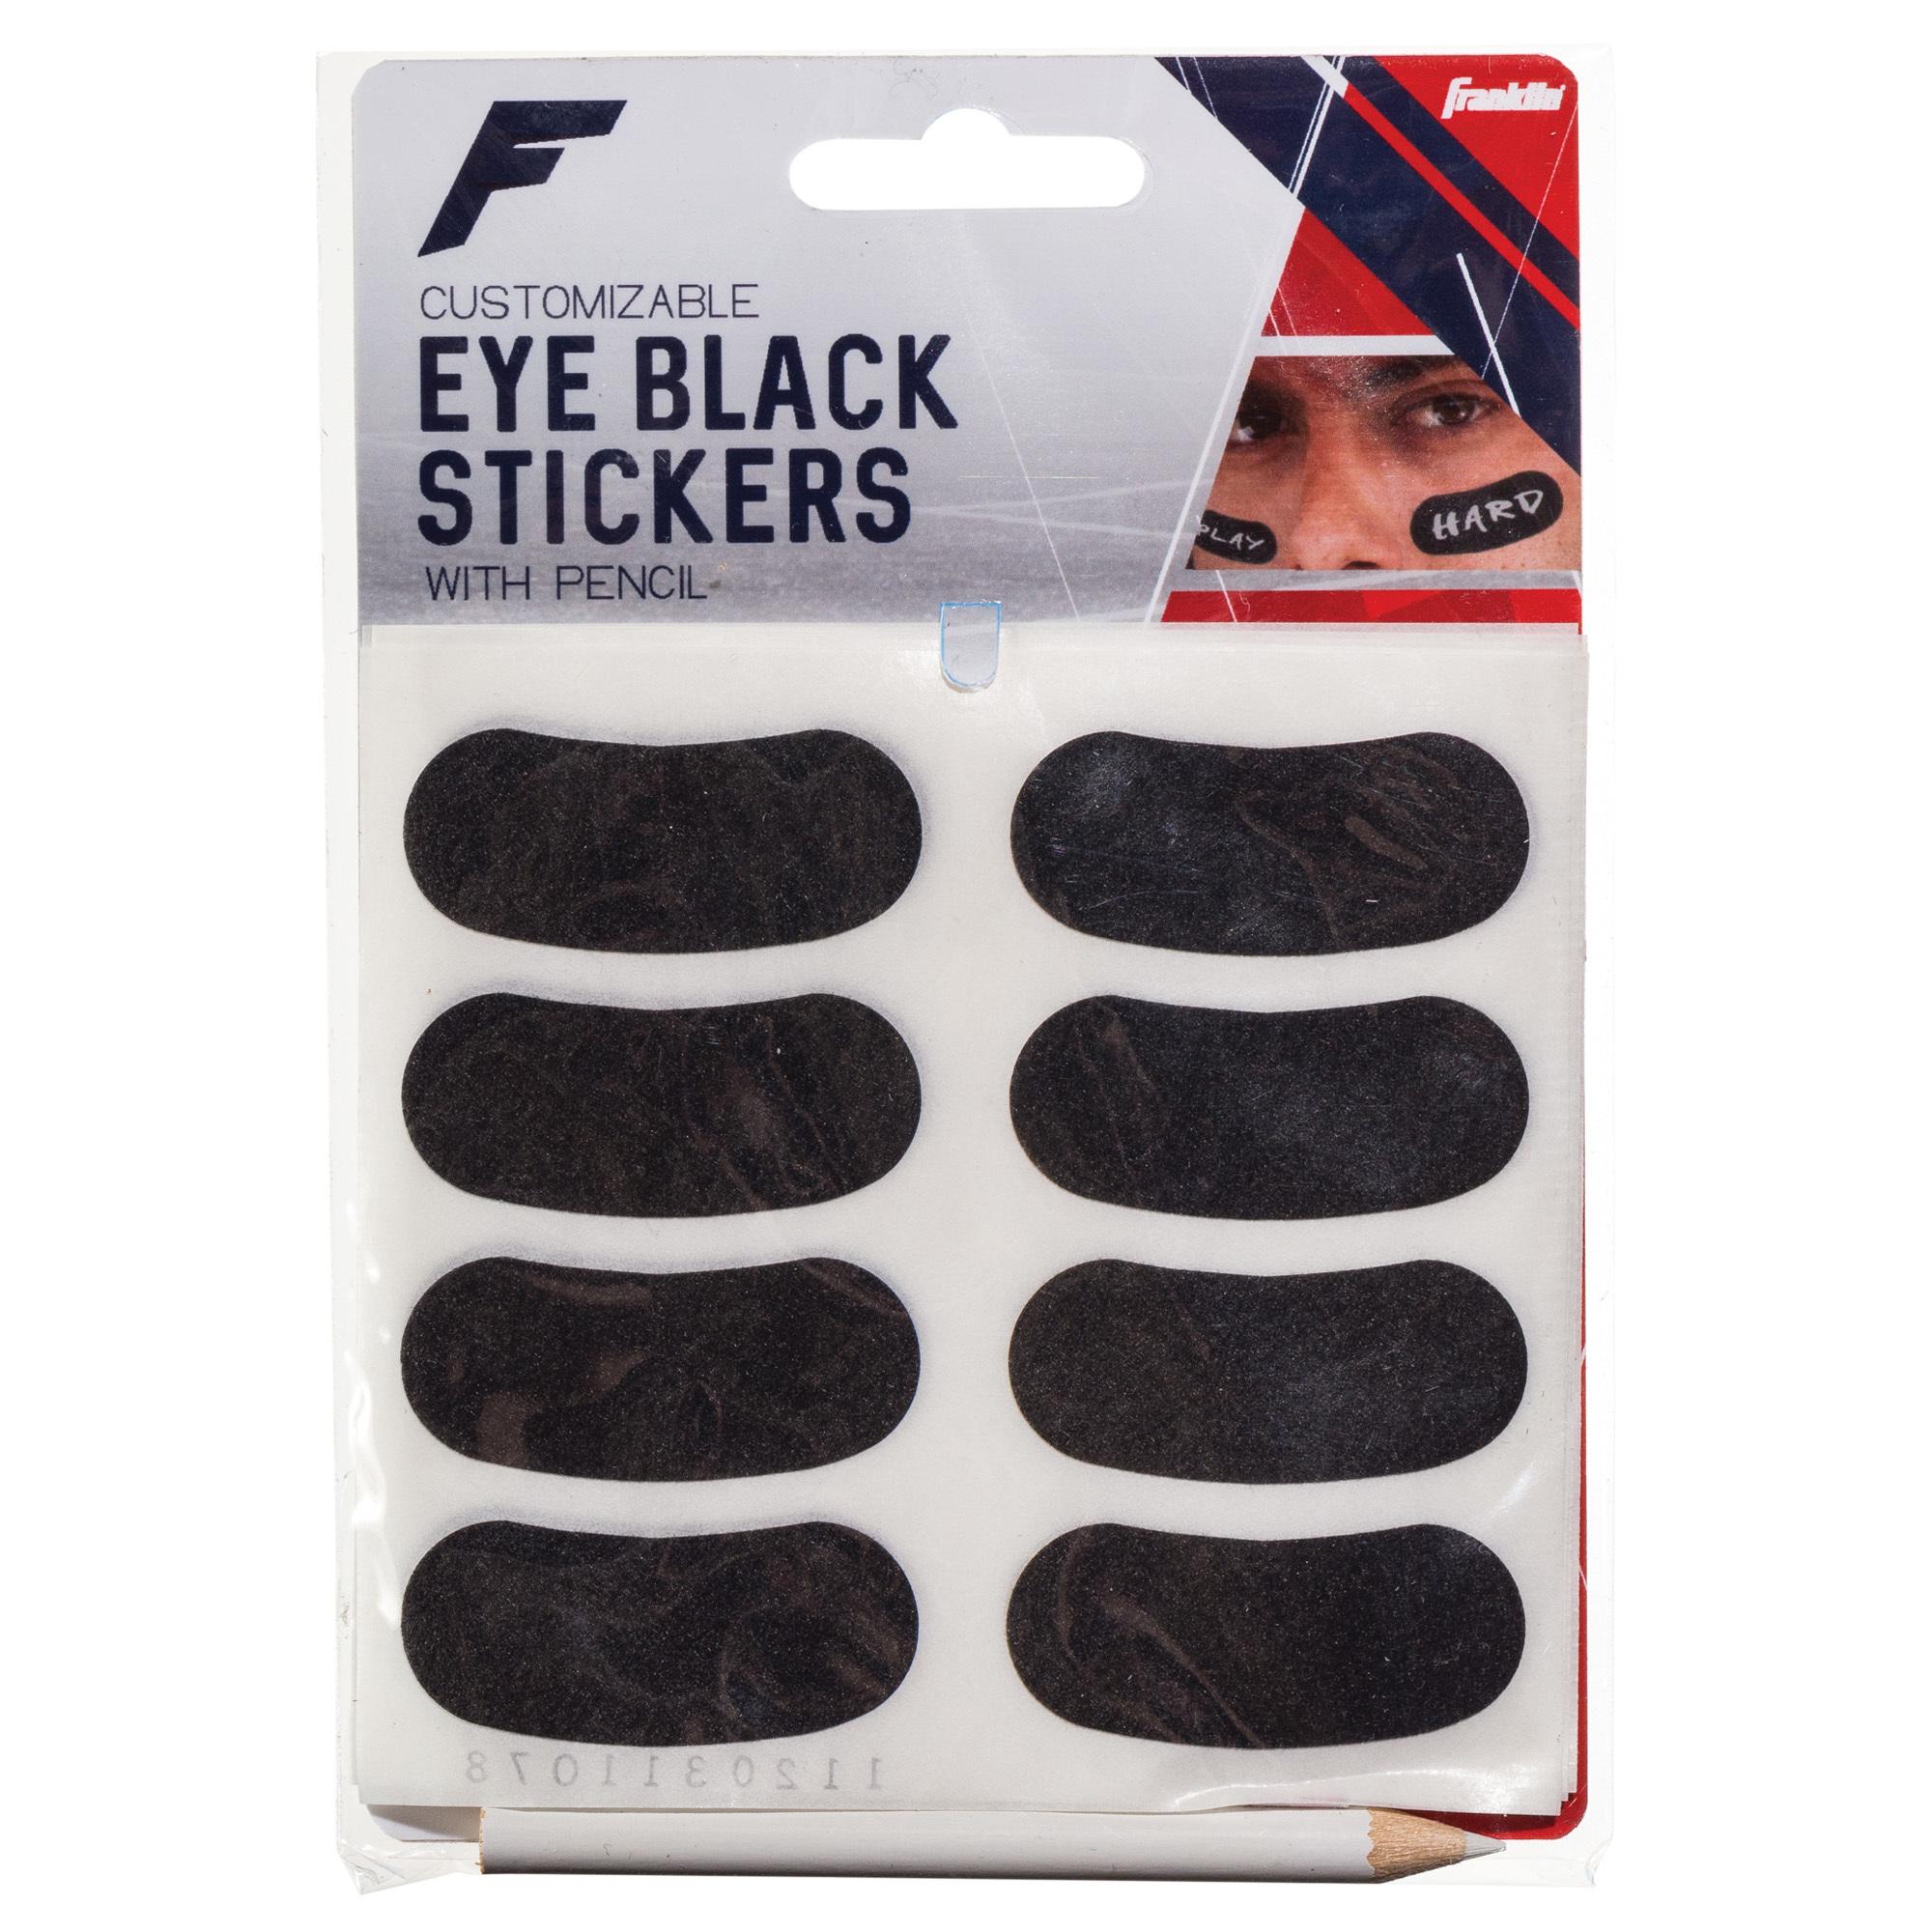 Franklin 11392S11 Eye Black Stickers 6Pk